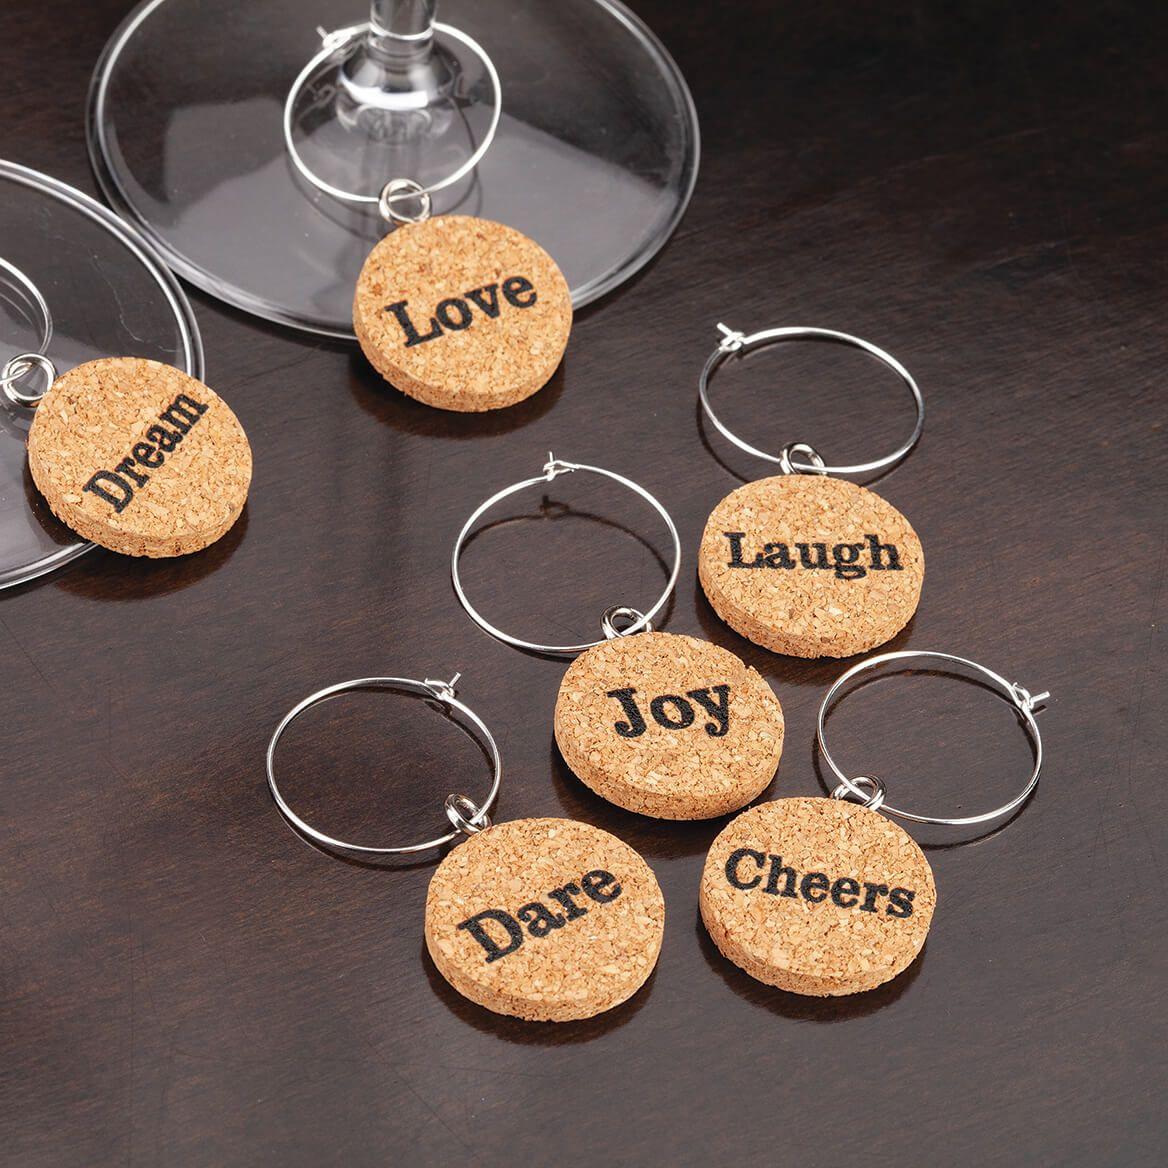 Inspirational Cork Wine Charms Set of 6-370884